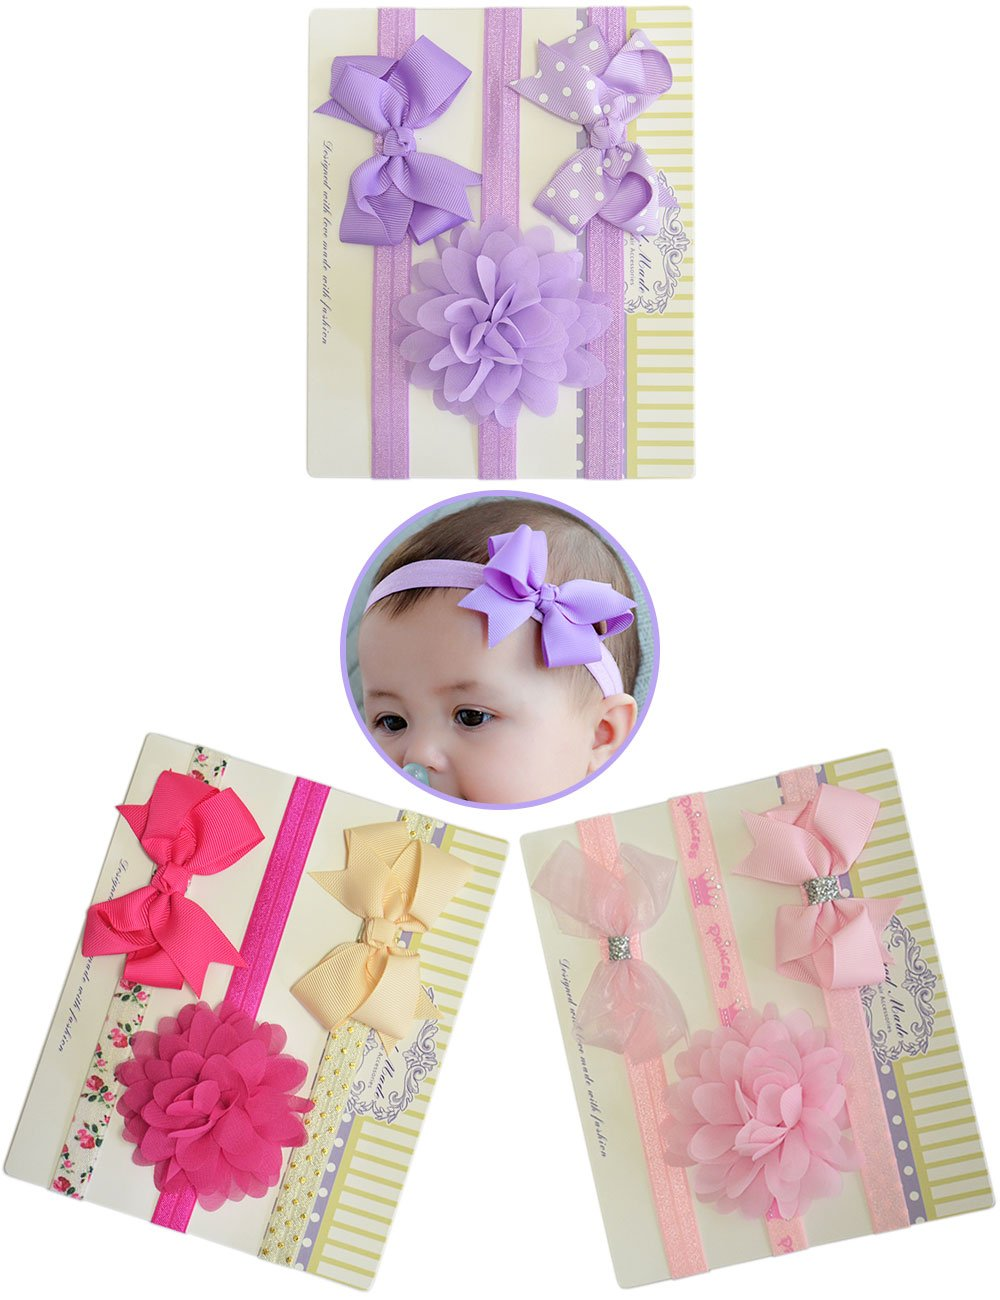 SnowArt Baby Headbands Flower Knotted Girls' Hairbands for Newborn,Infant,Toddler,Children Sets (9Color_style2)